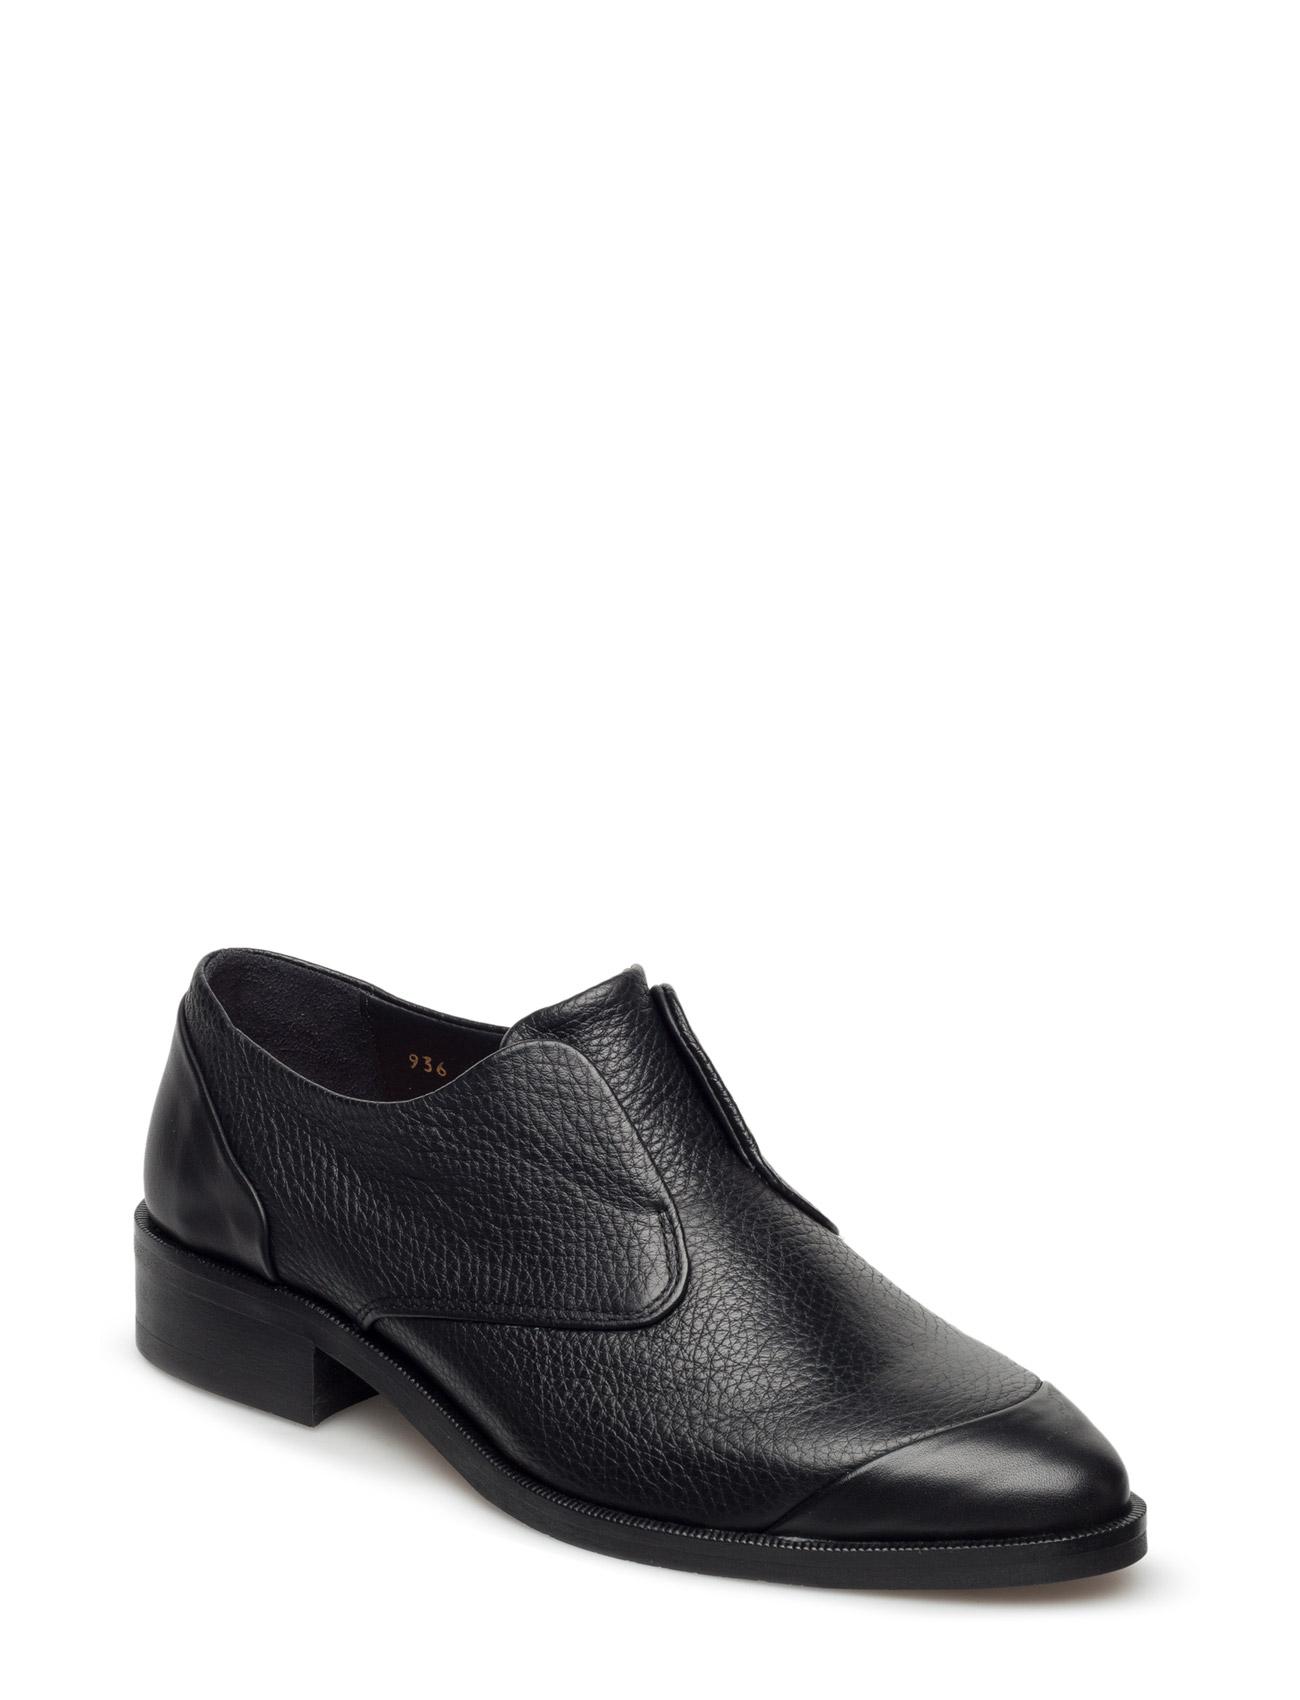 Prime Derby No Lace Caviar Royal RepubliQ Flade sko til Damer i